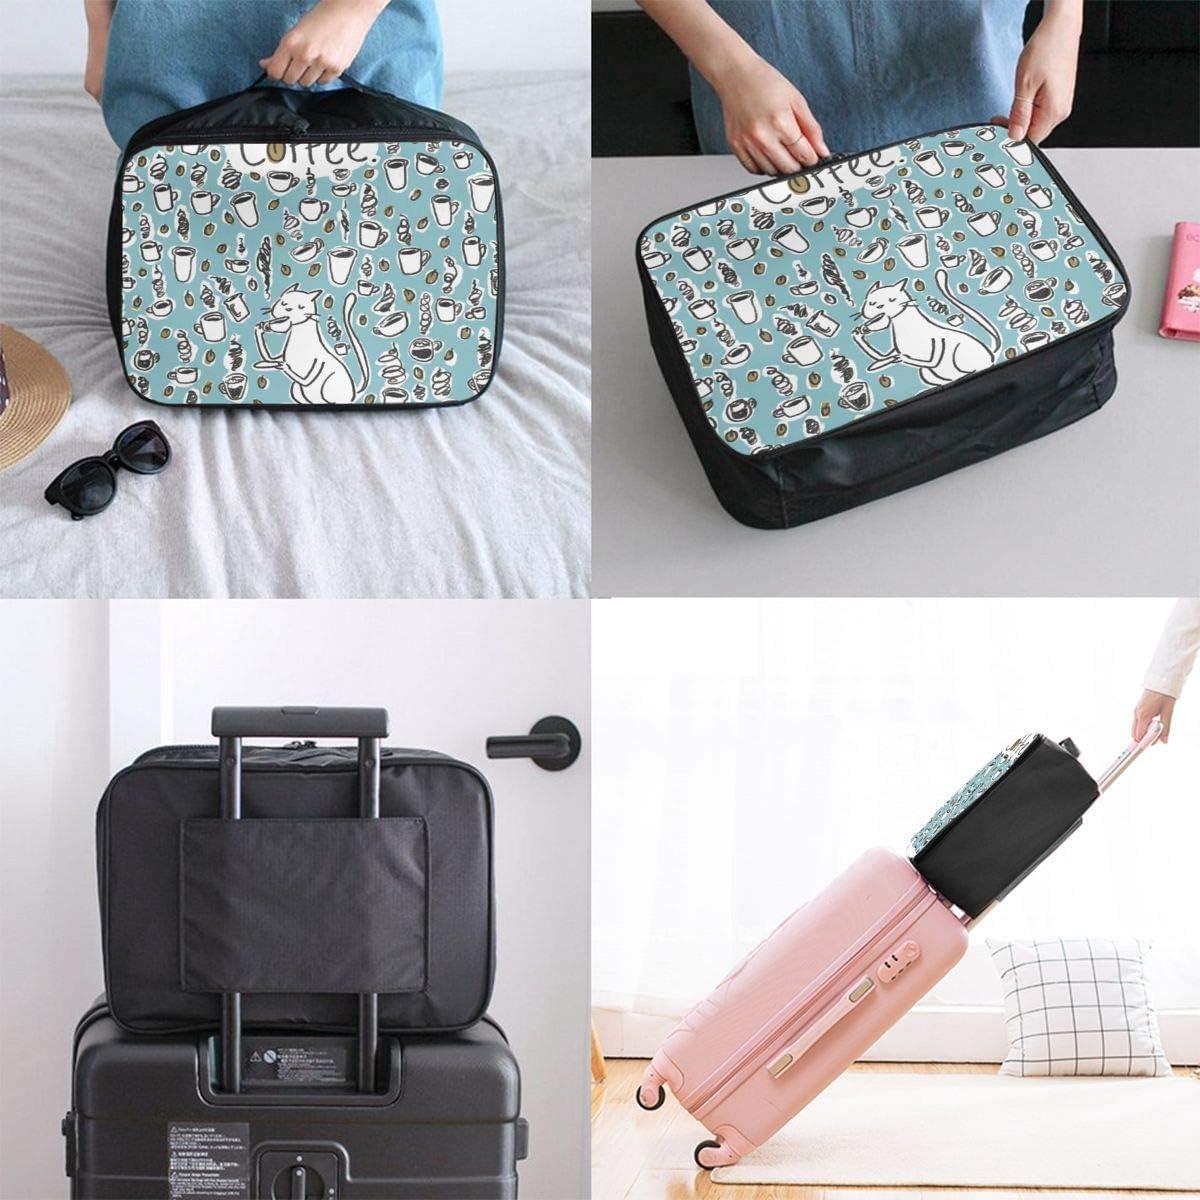 Pattern Travel Carry-on Luggage Weekender Bag Overnight Tote Flight Duffel In Trolley Handle